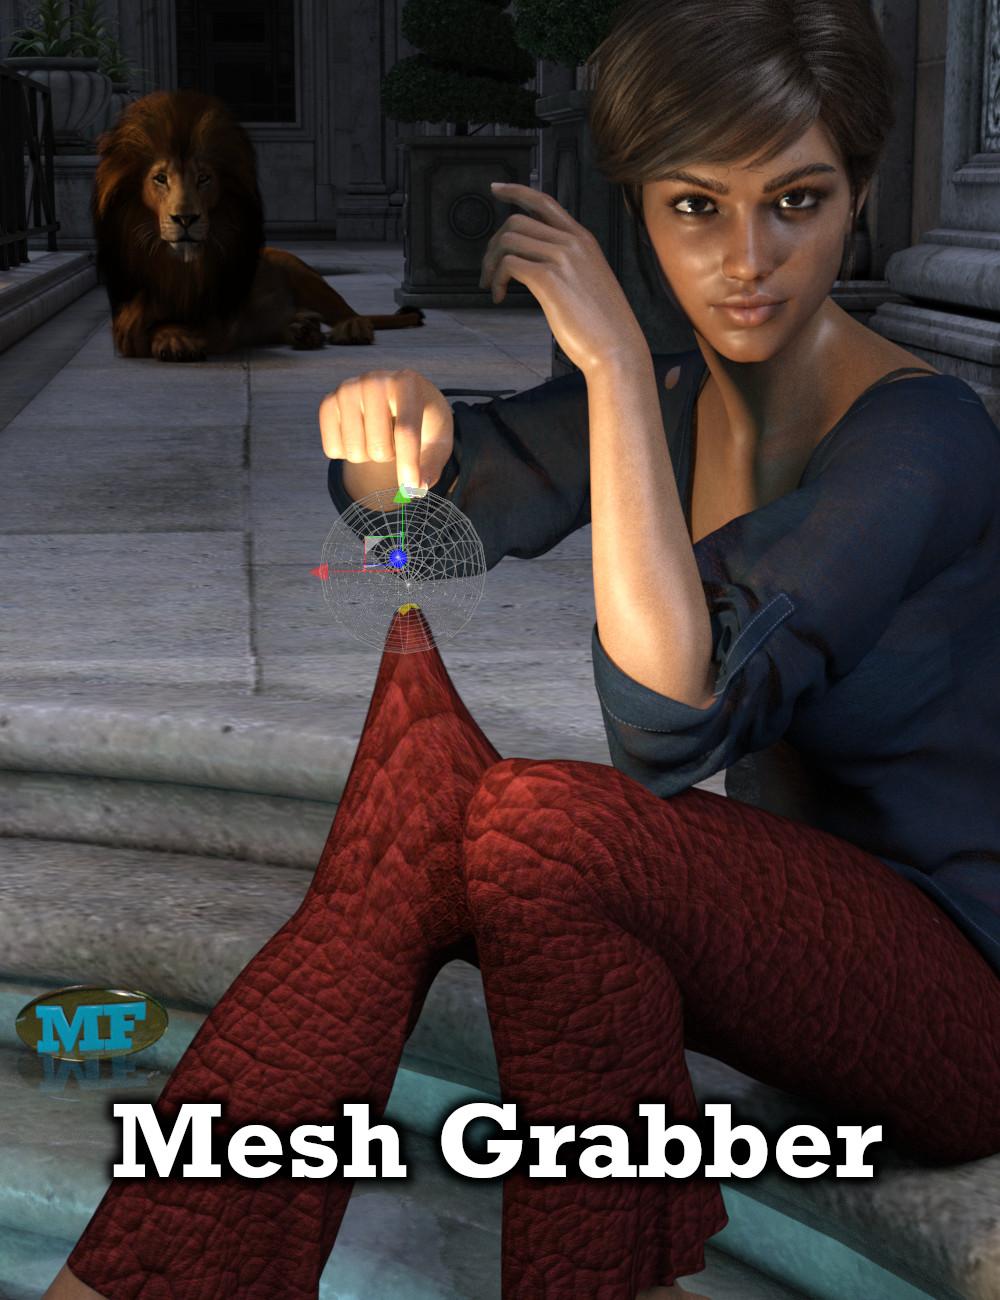 Mesh Grabber (Mac) by: ManFriday, 3D Models by Daz 3D